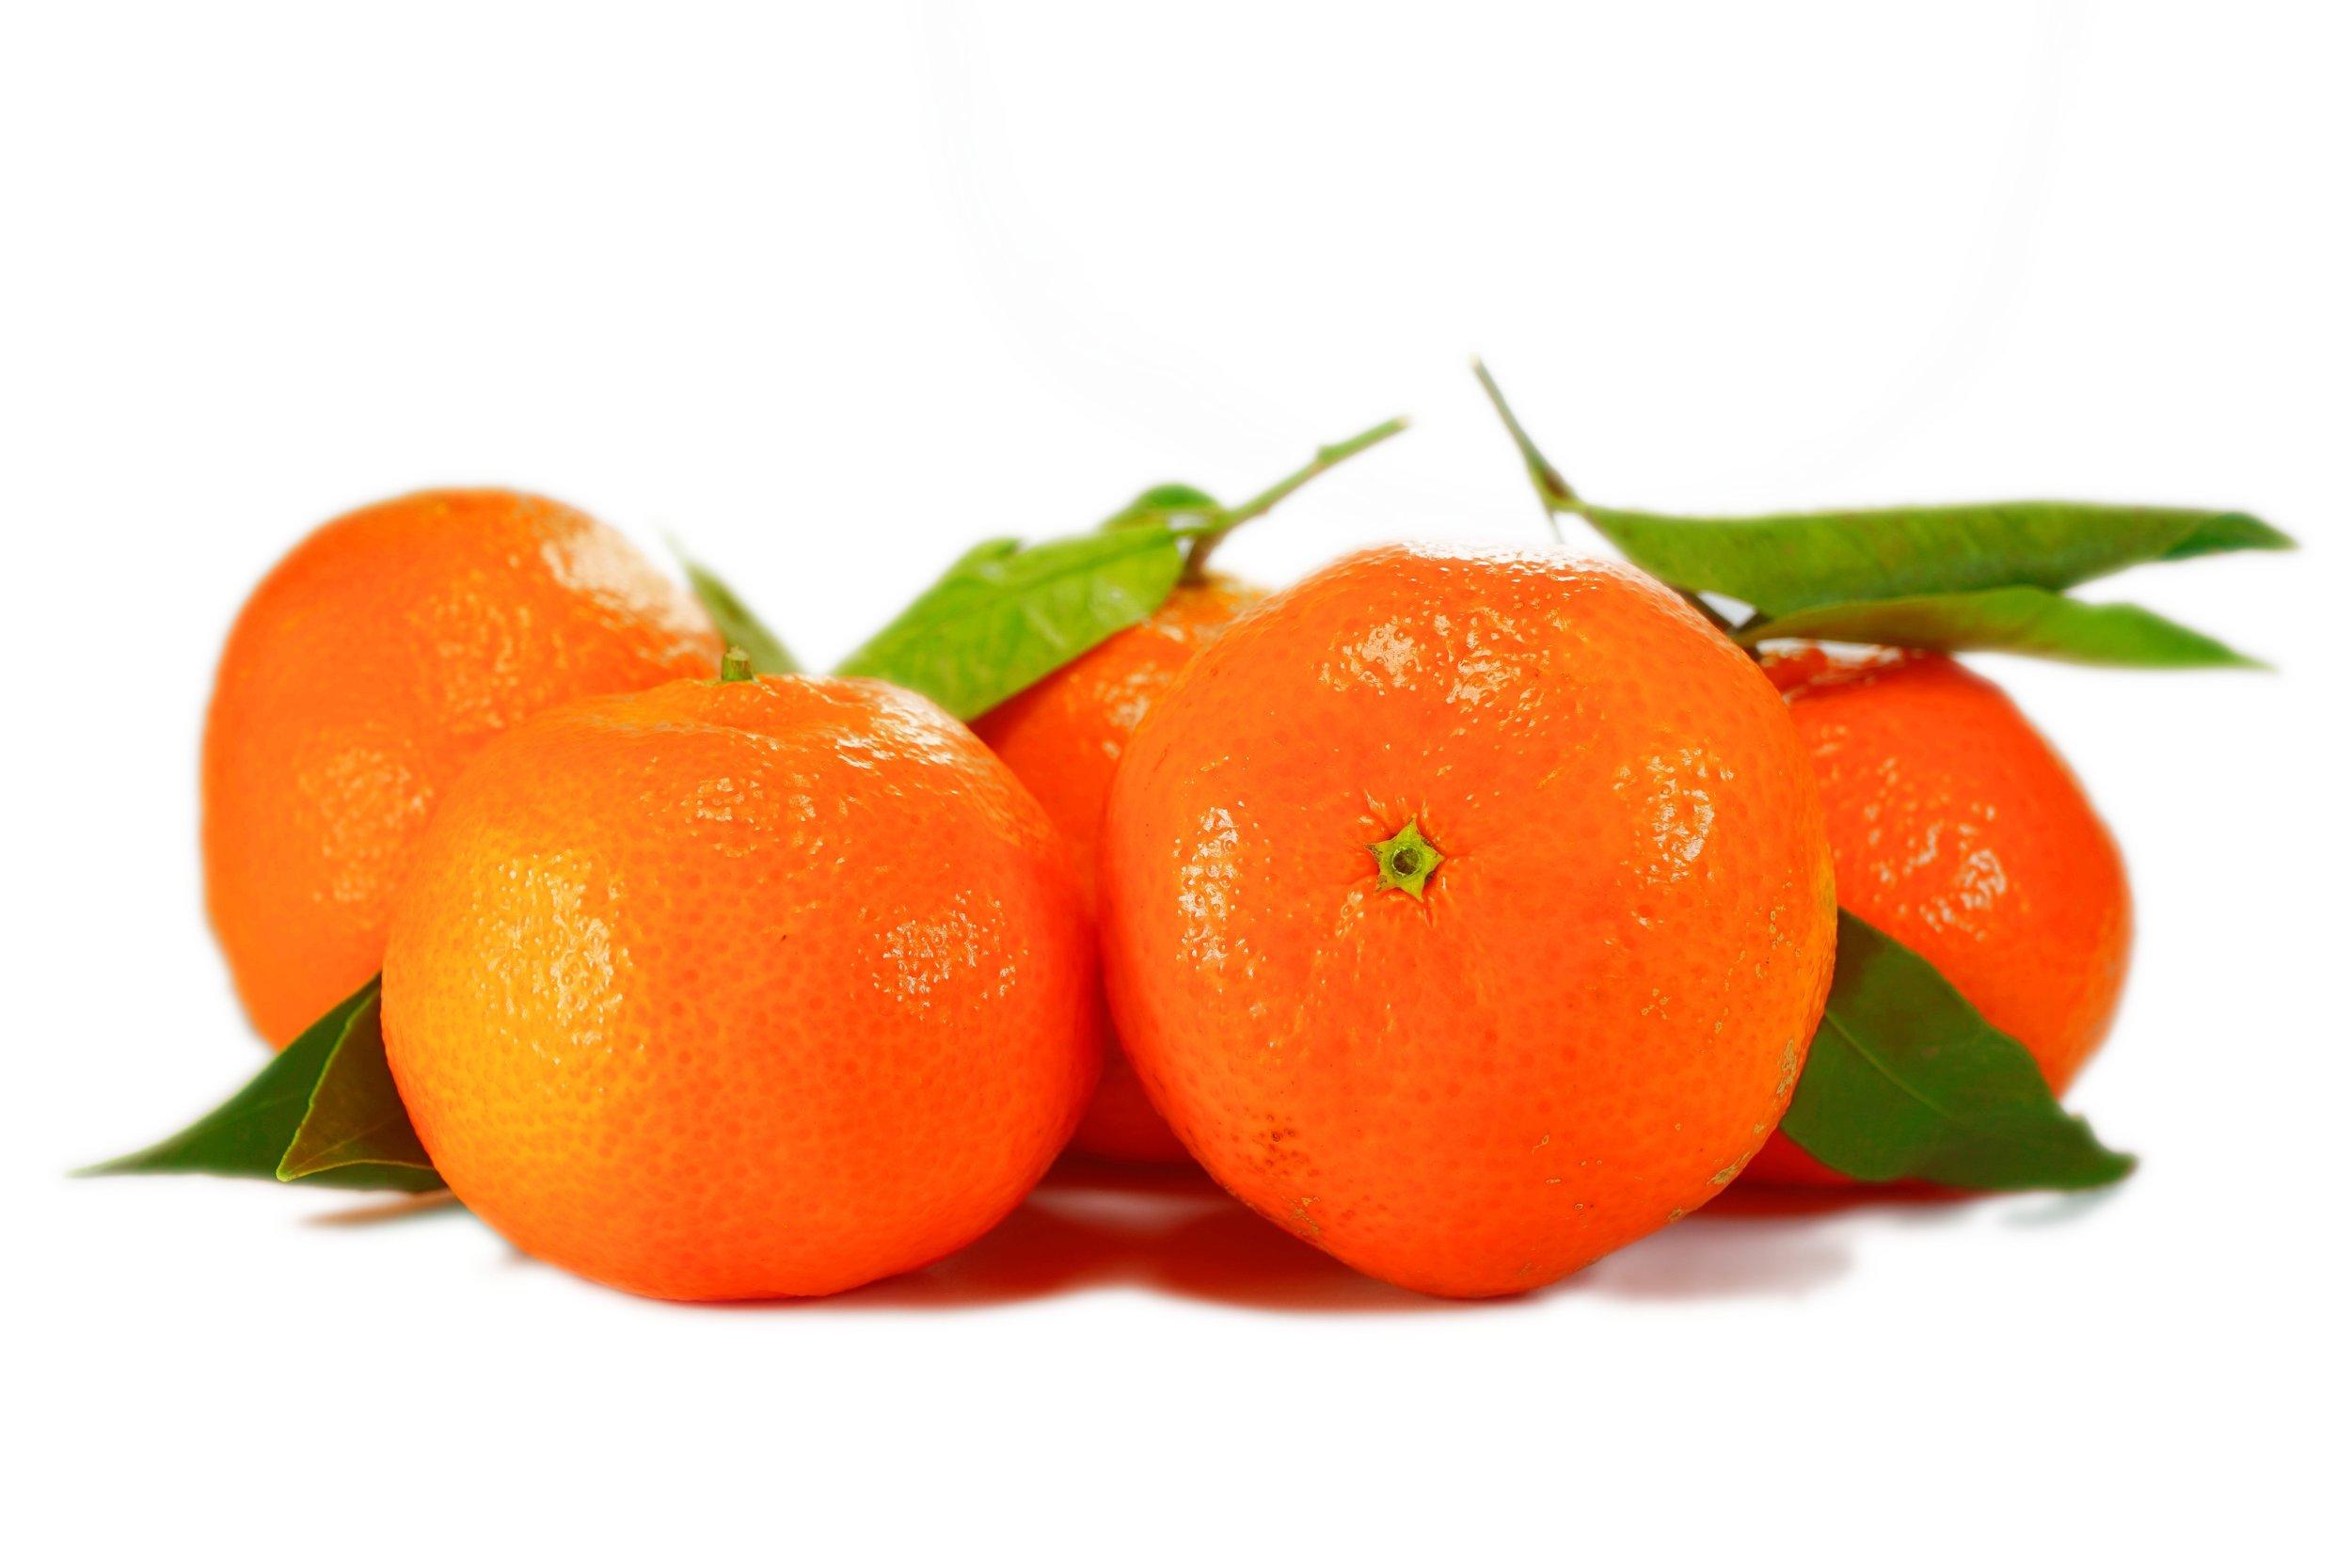 Oranges on white surface.